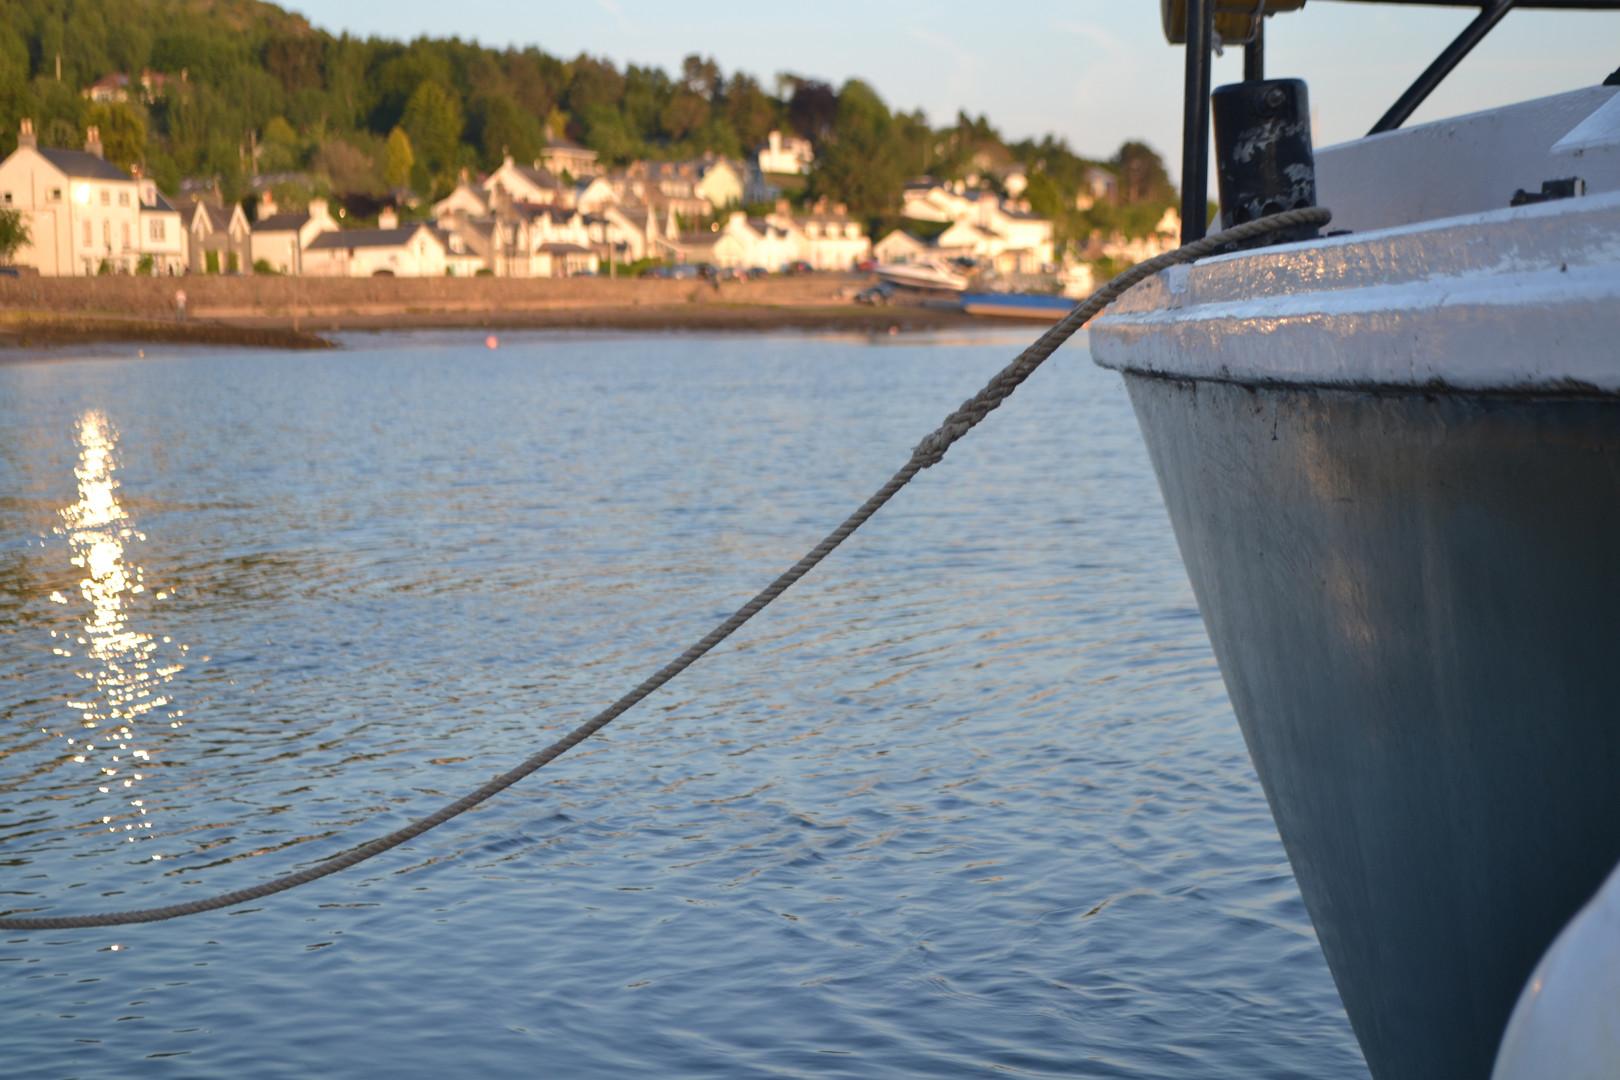 Kippford on the Urr Estuary.